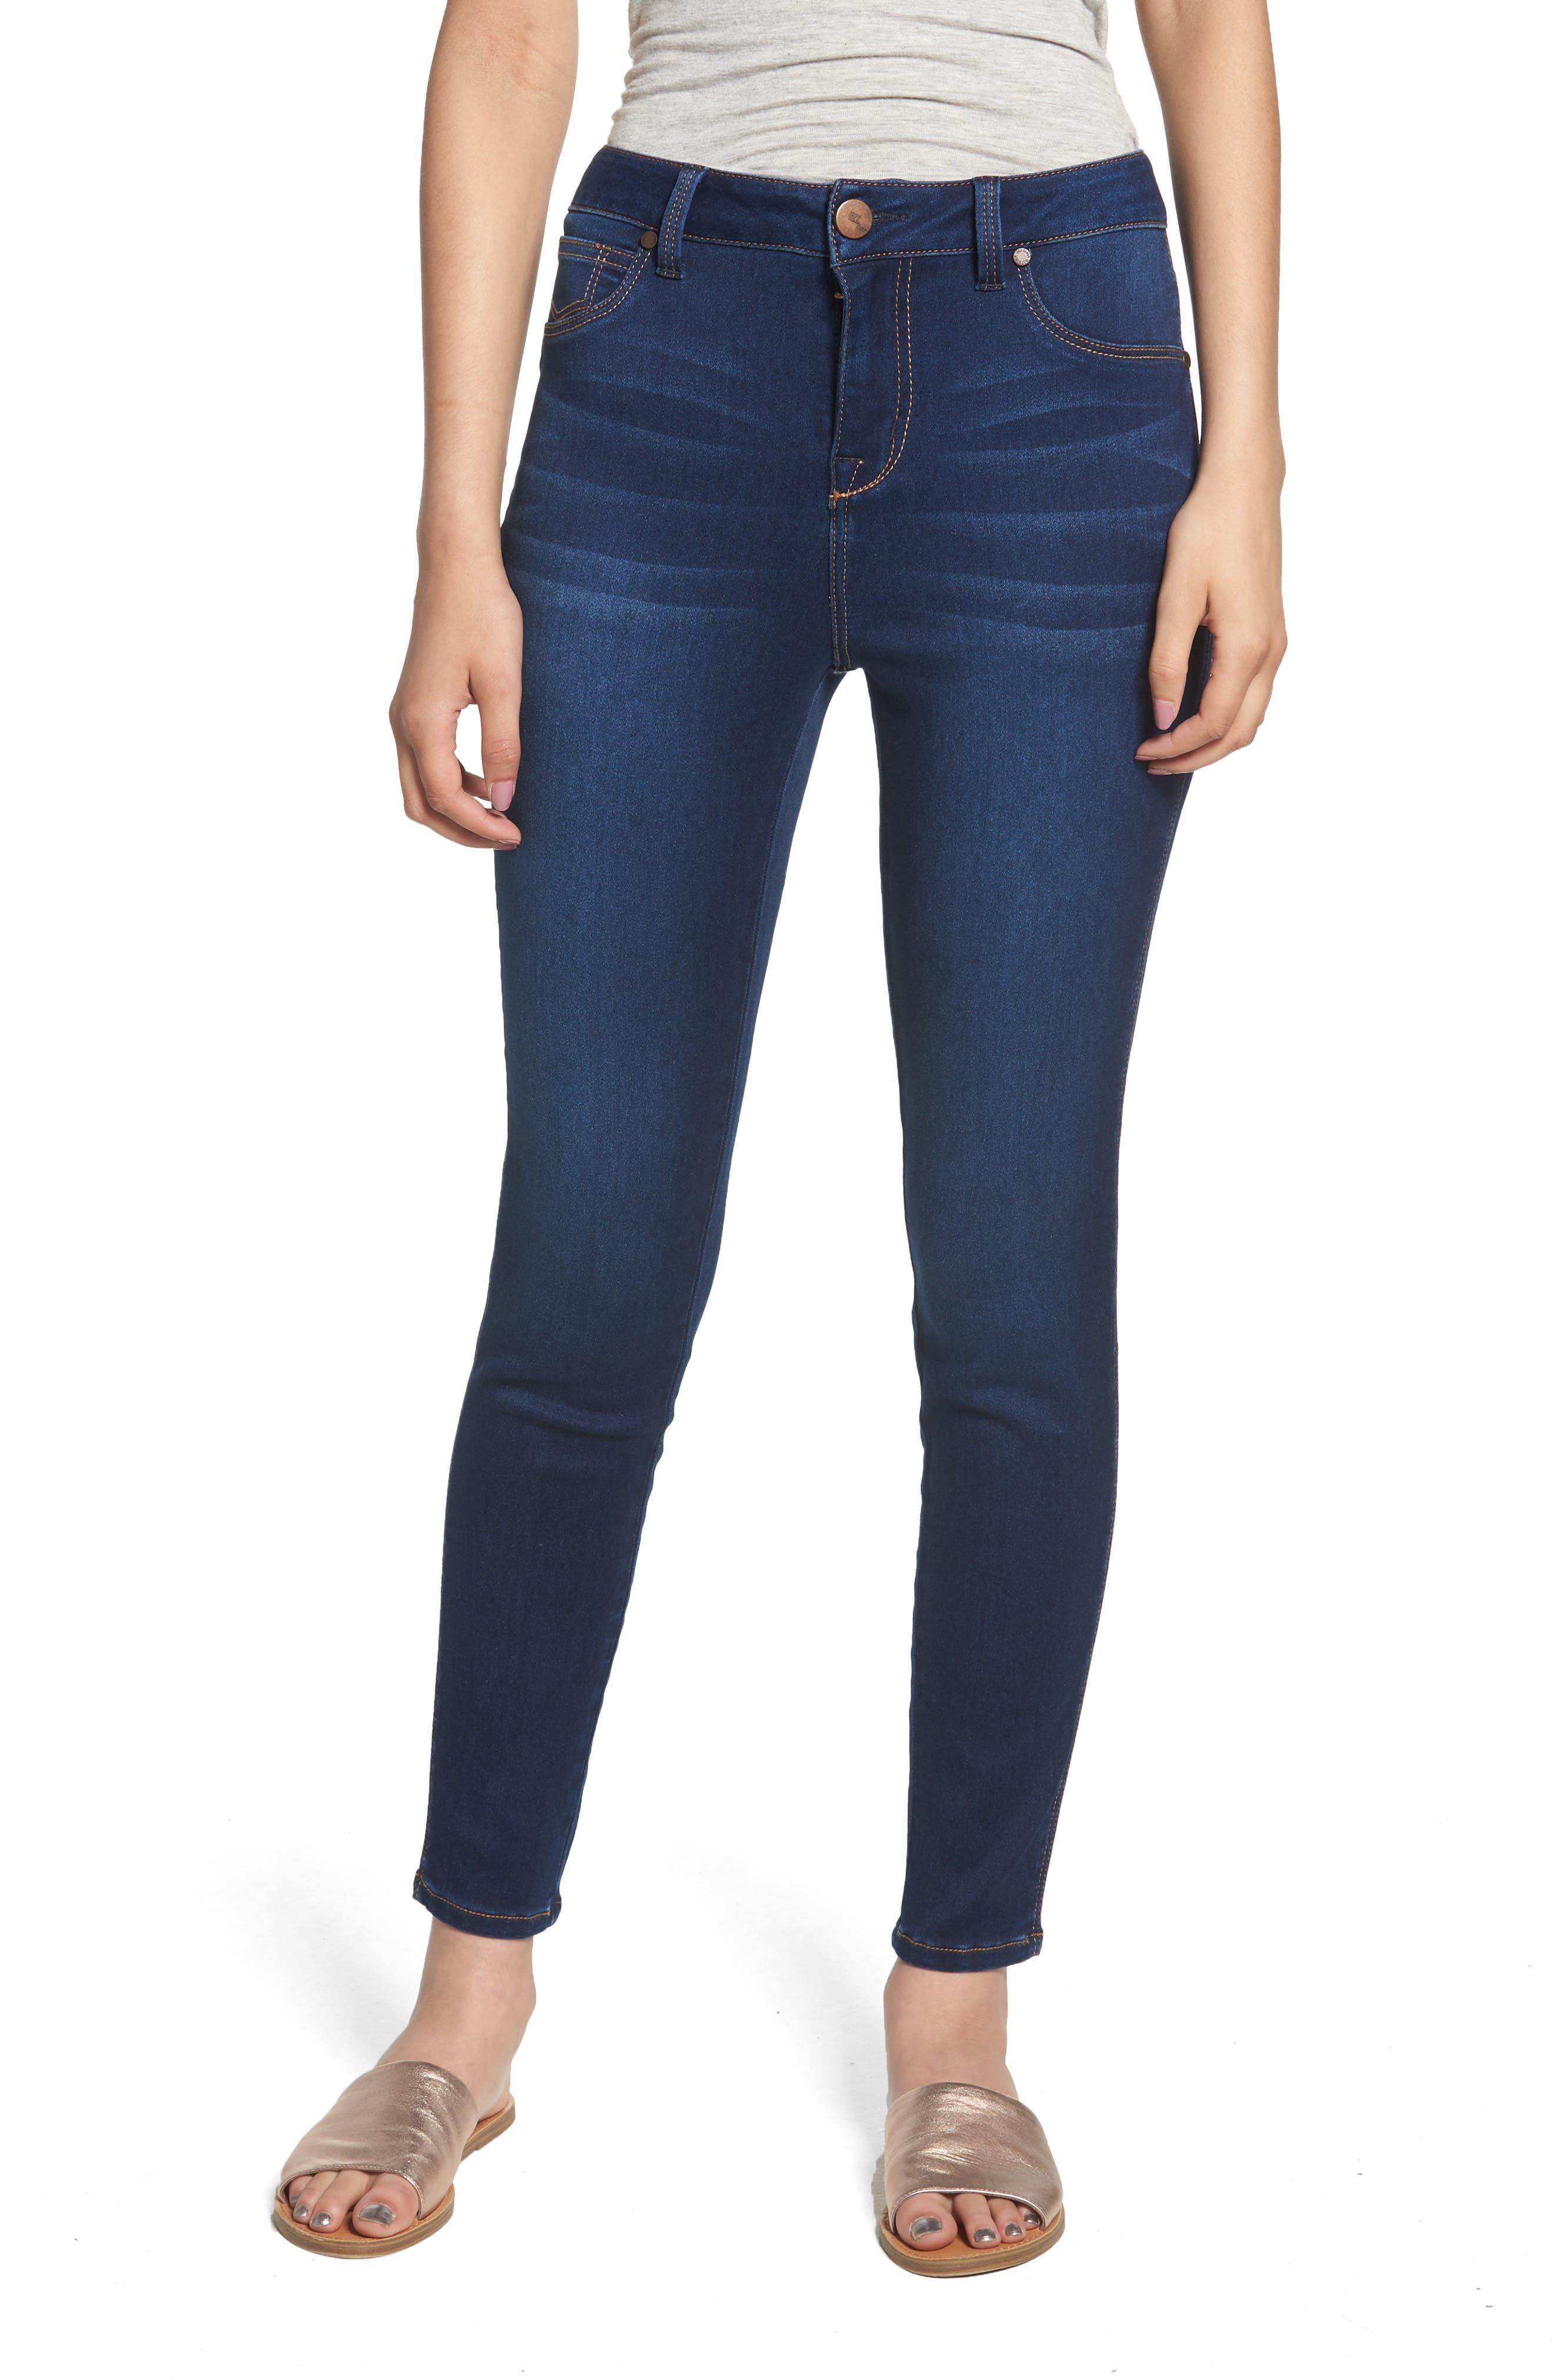 1822 DENIM,                             Butter High Rise Skinny Jeans,                             Main thumbnail 1, color,                             LENNOX